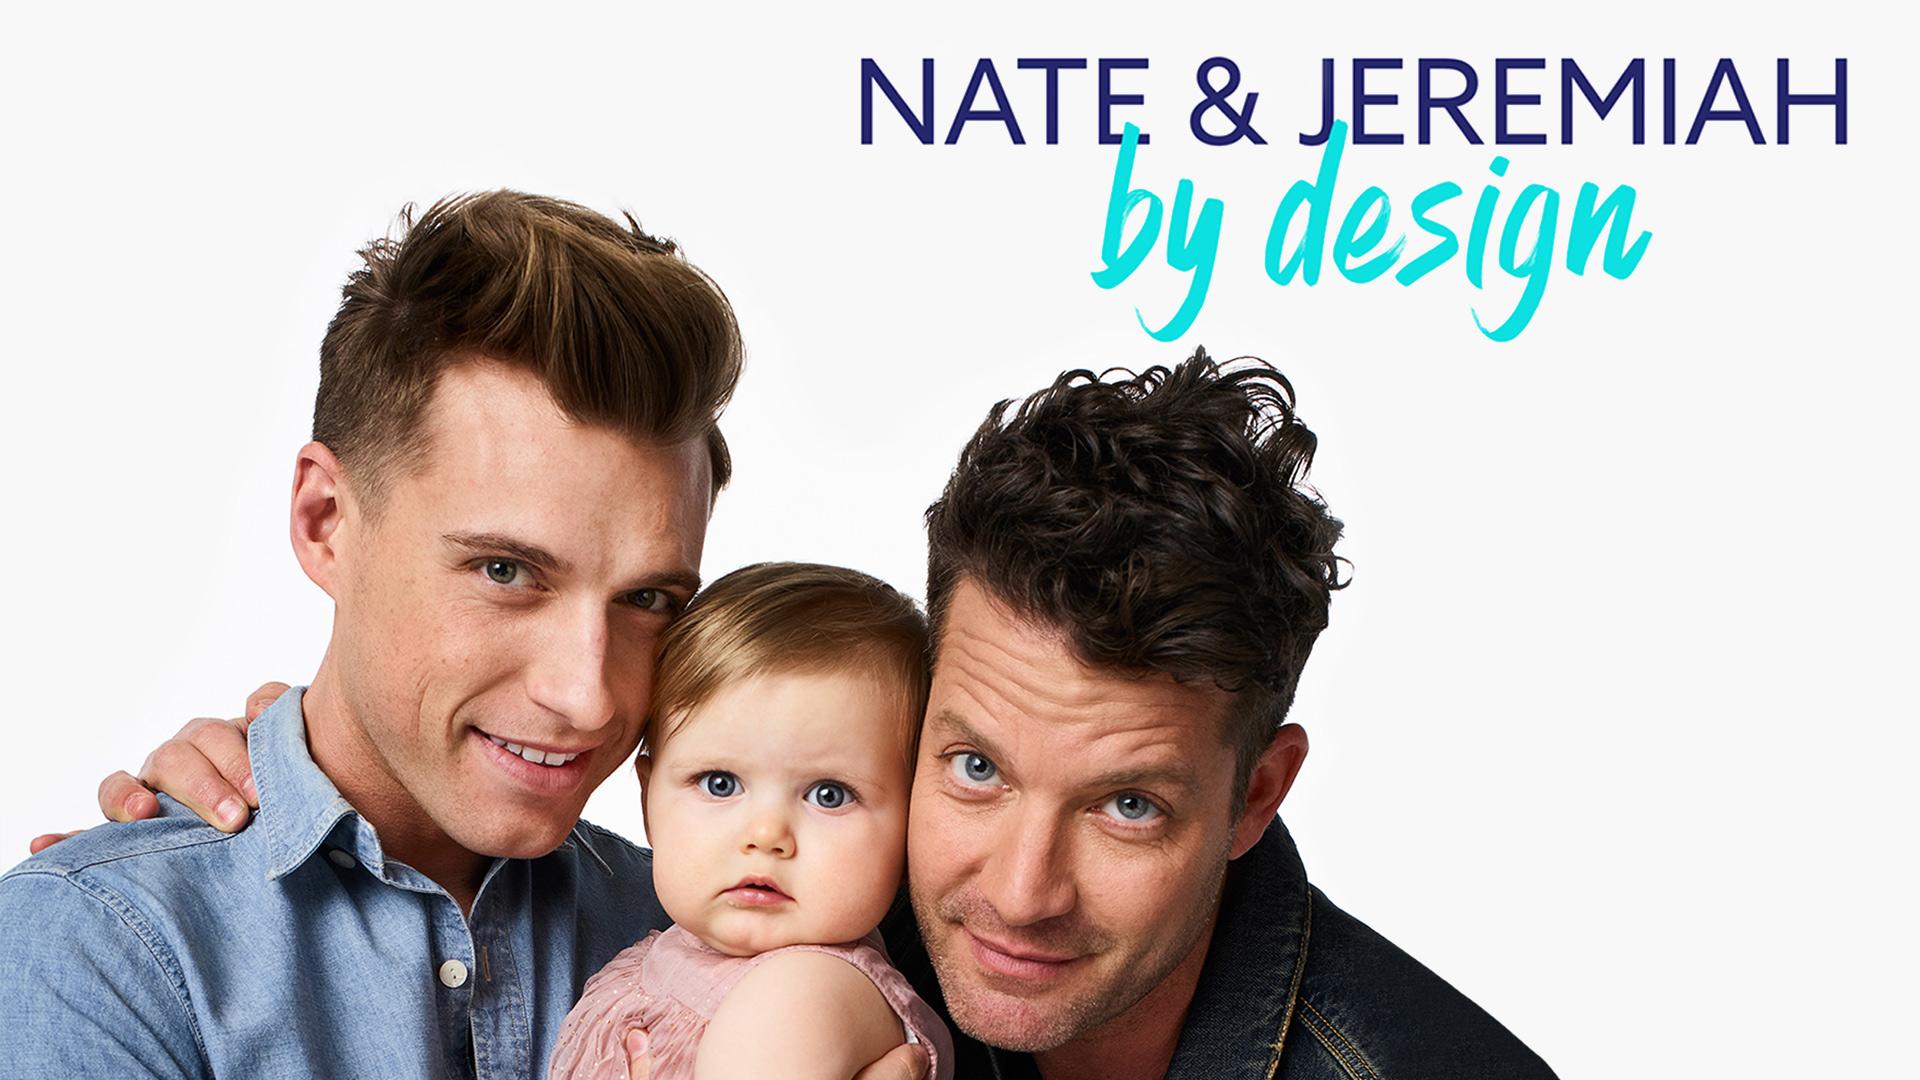 Nate & Jeremiah By Design Season 1